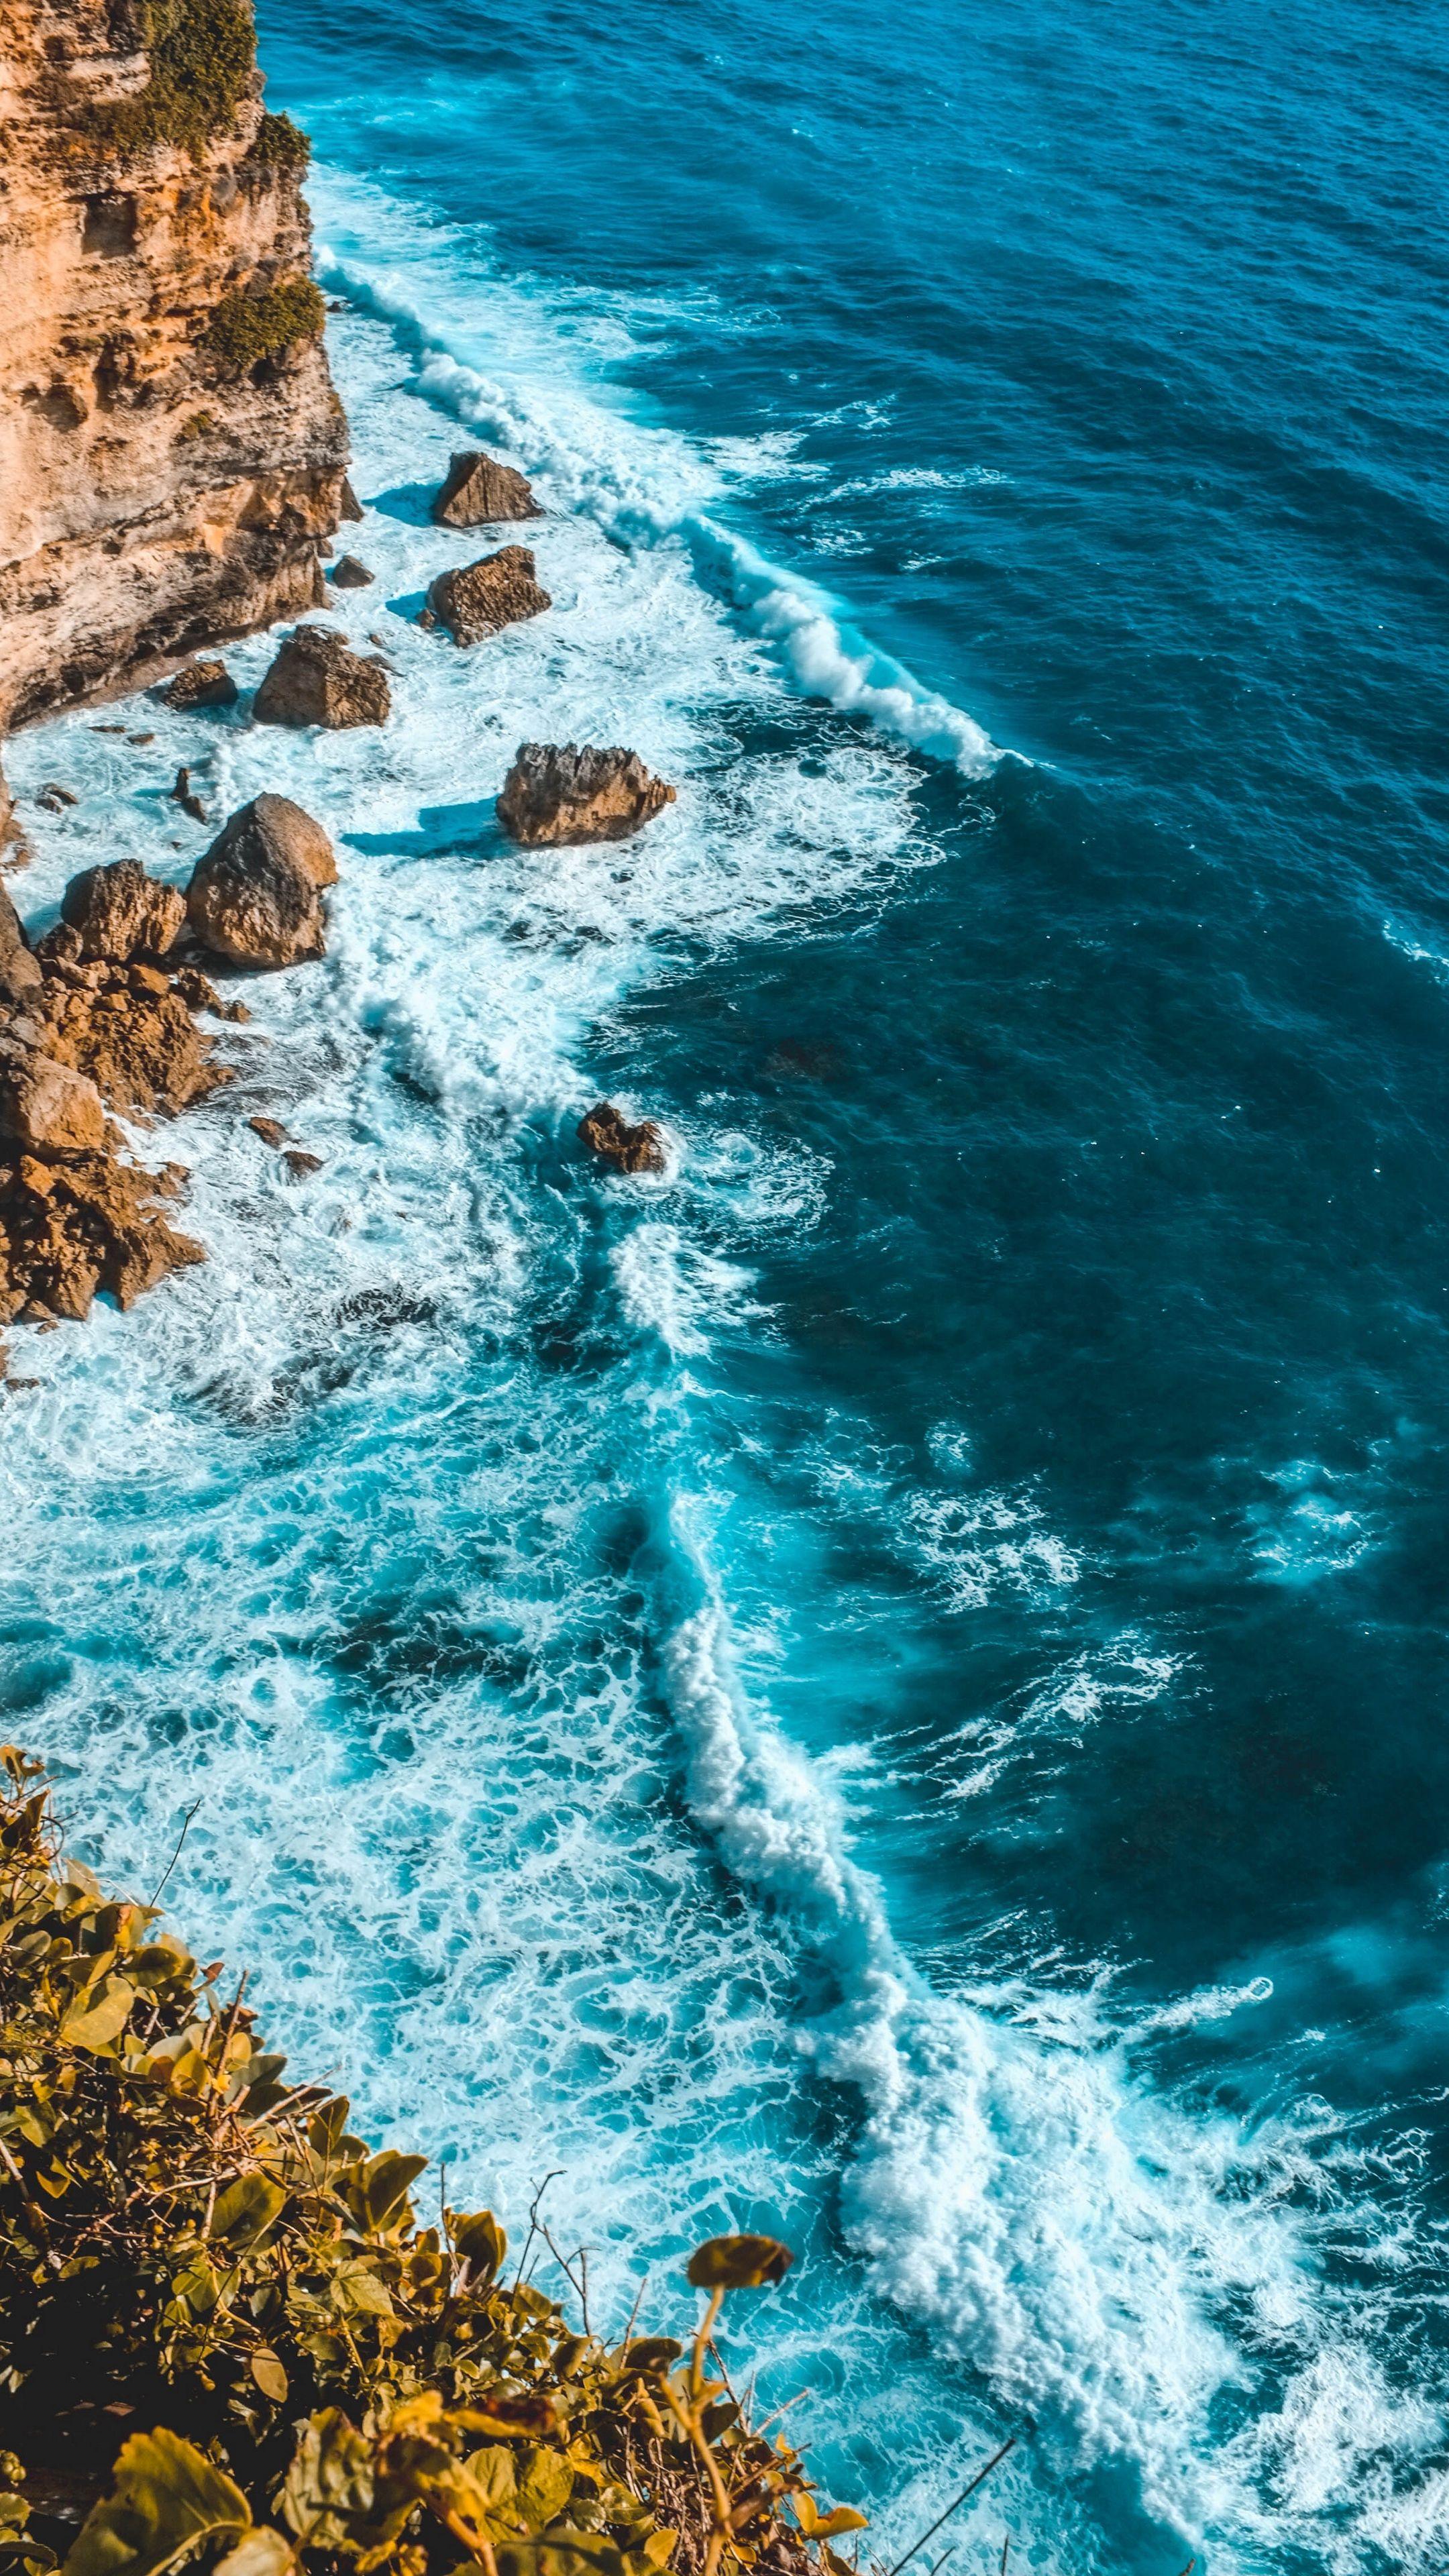 Sea ocean beach aerial iPhone wallpaper HD | Wallpapers & Backgrounds in 2019 | Ocean wallpaper ...